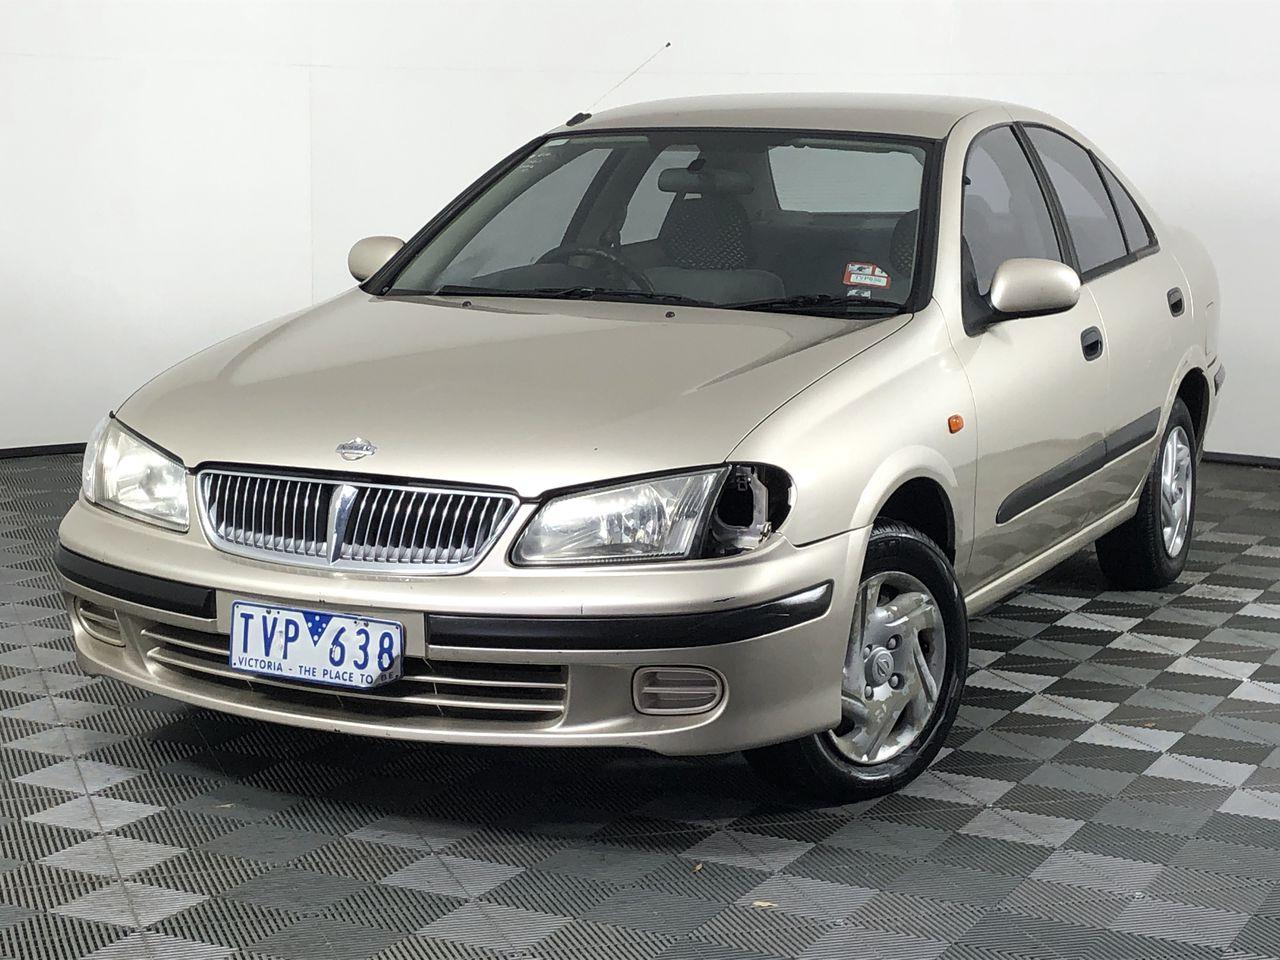 2002 Nissan Pulsar ST N16 Manual Sedan